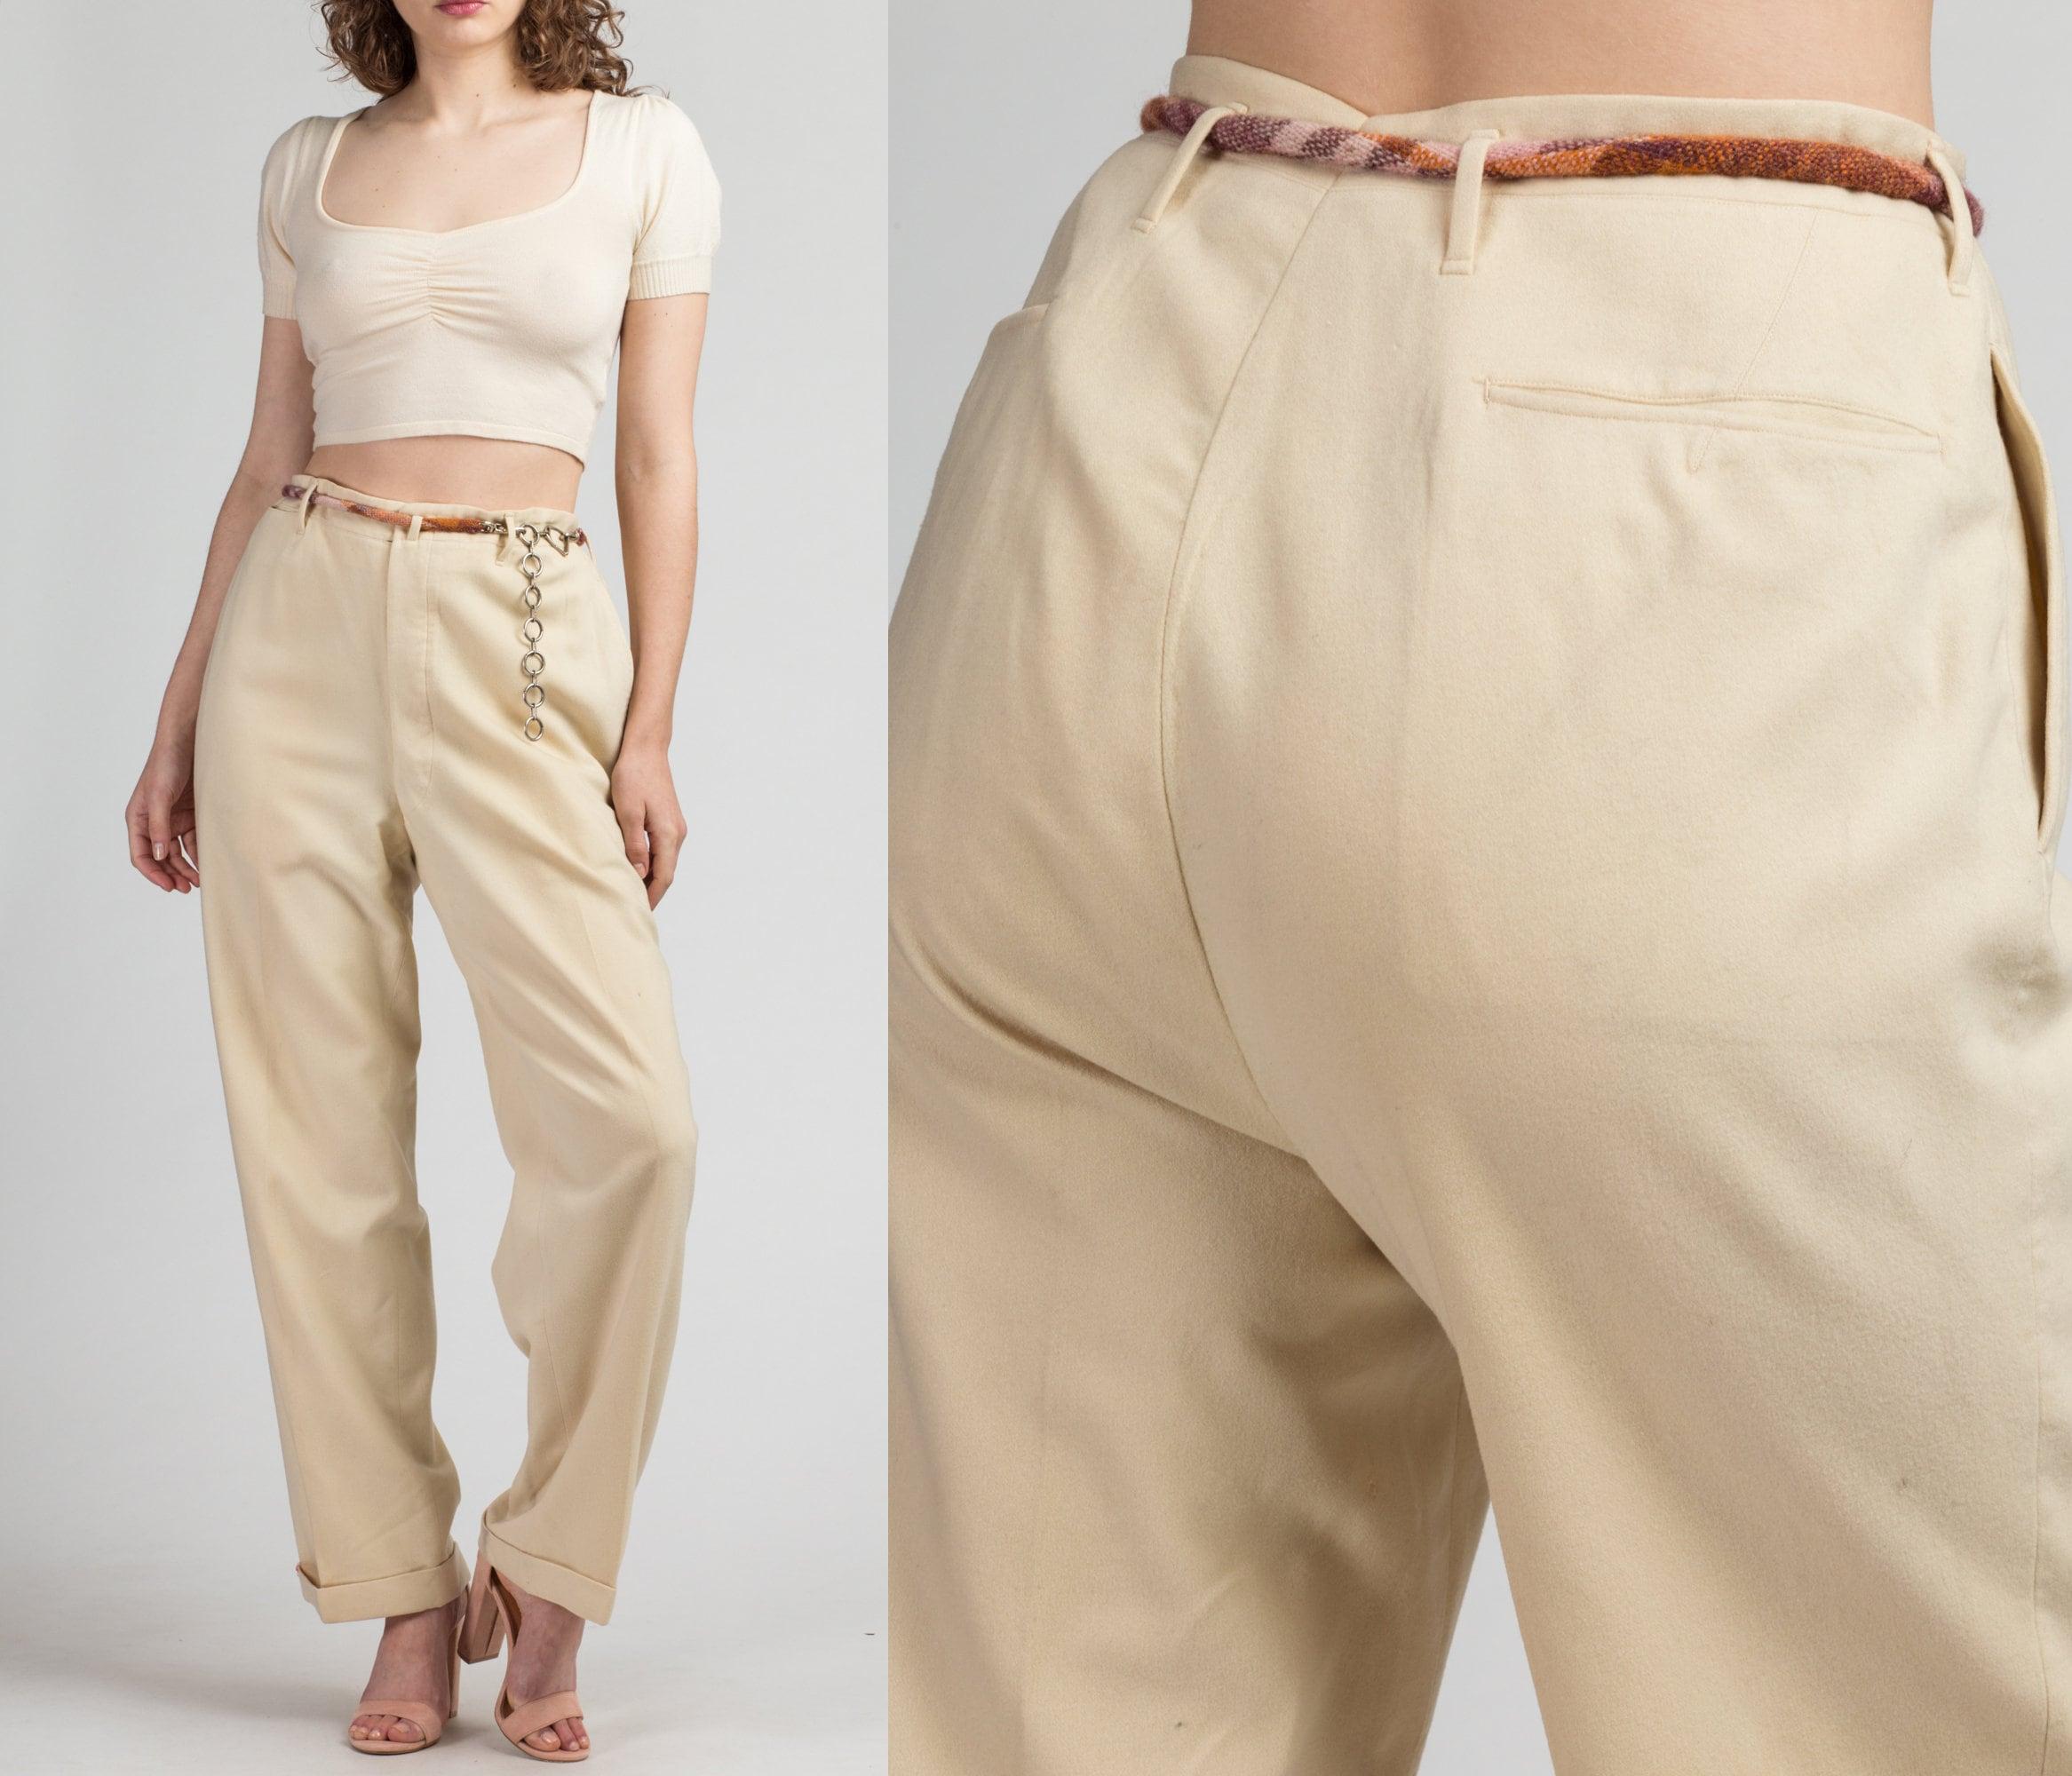 1950s Mens Suits & Sport Coats   50s Suits & Blazers Vintage 50S 60S Cream Wool High Waisted Pants - Mens Medium, Womens Large, 33  Formal Suspender Button Suit Trousers $19.95 AT vintagedancer.com